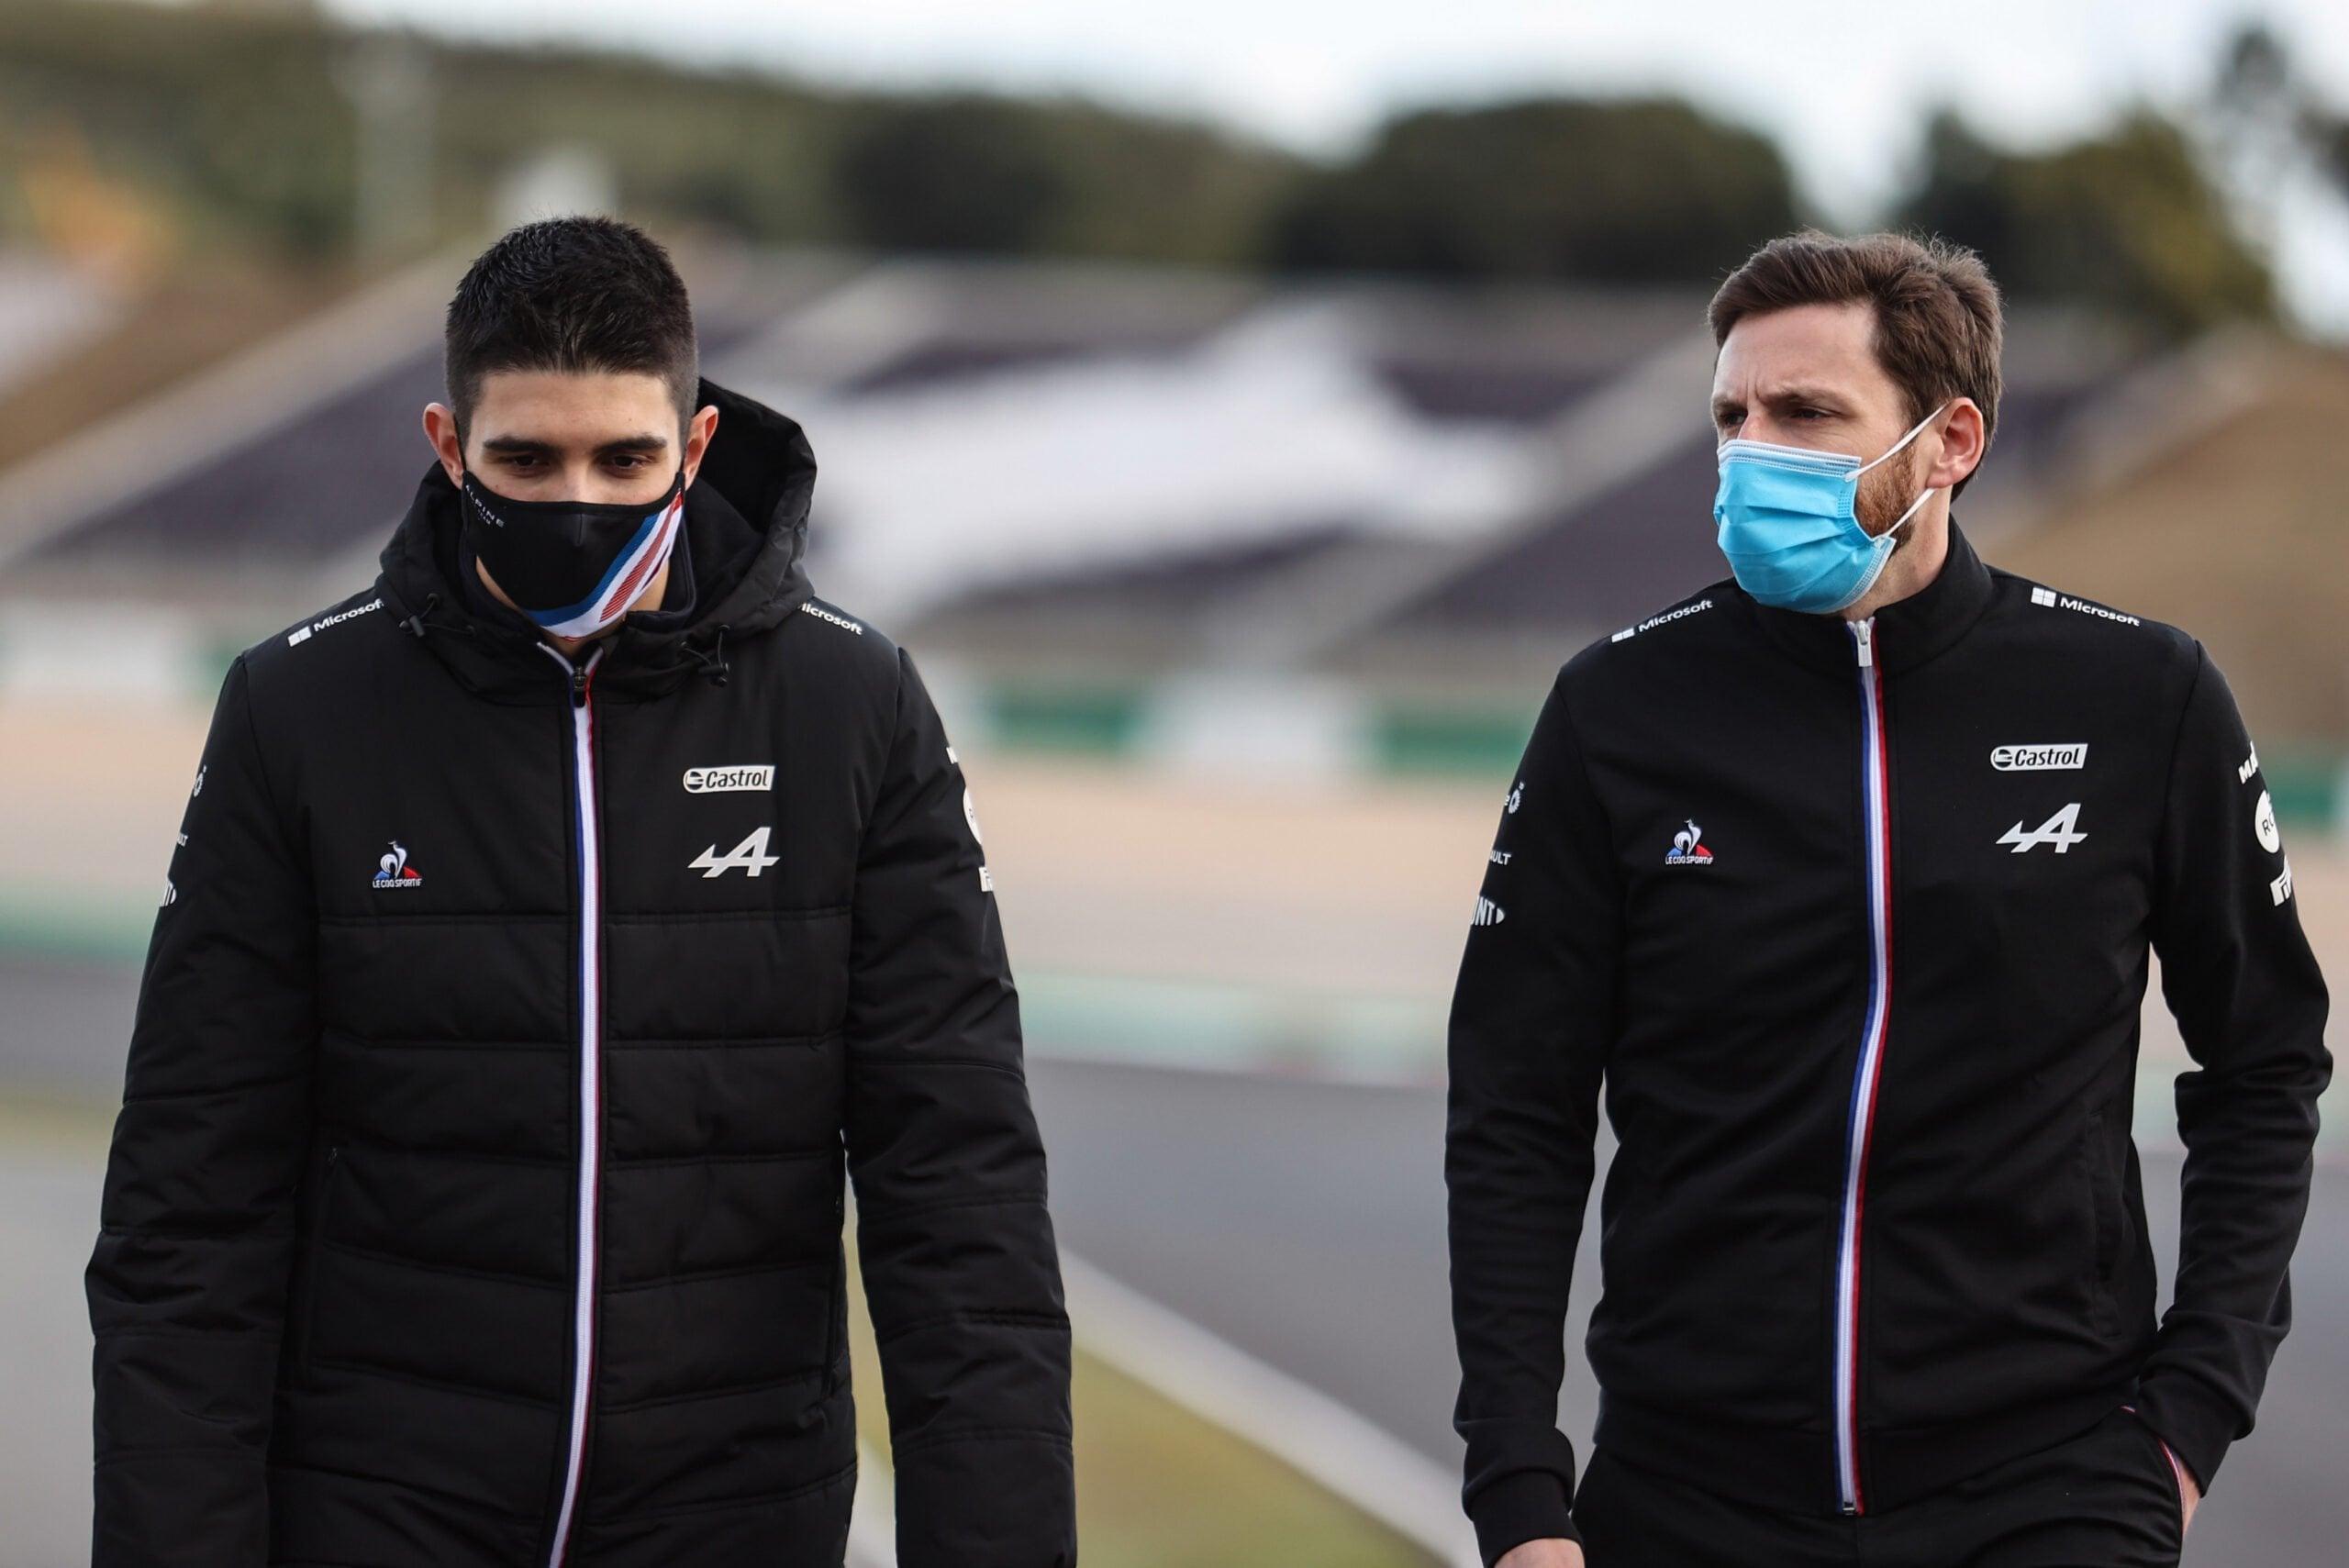 Alpine F1 Team alonso ocon Grand Prix Heineken du Portugal Formule 1 202114 scaled | Alpine F1 Team : Grand Prix Heineken du Portugal de Formule 1 2021